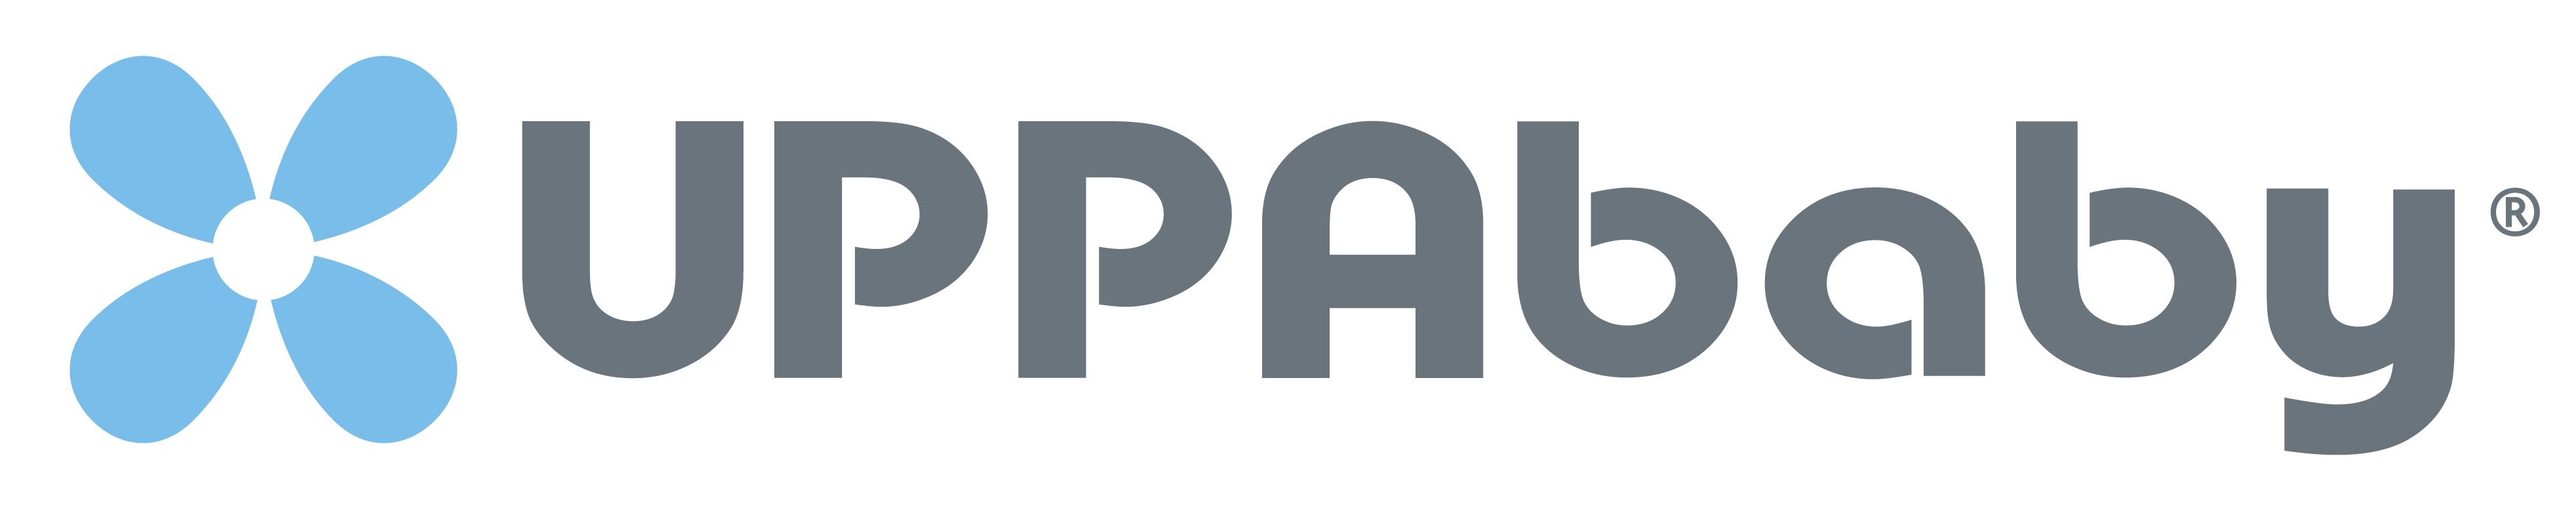 uppababy-logo.jpg